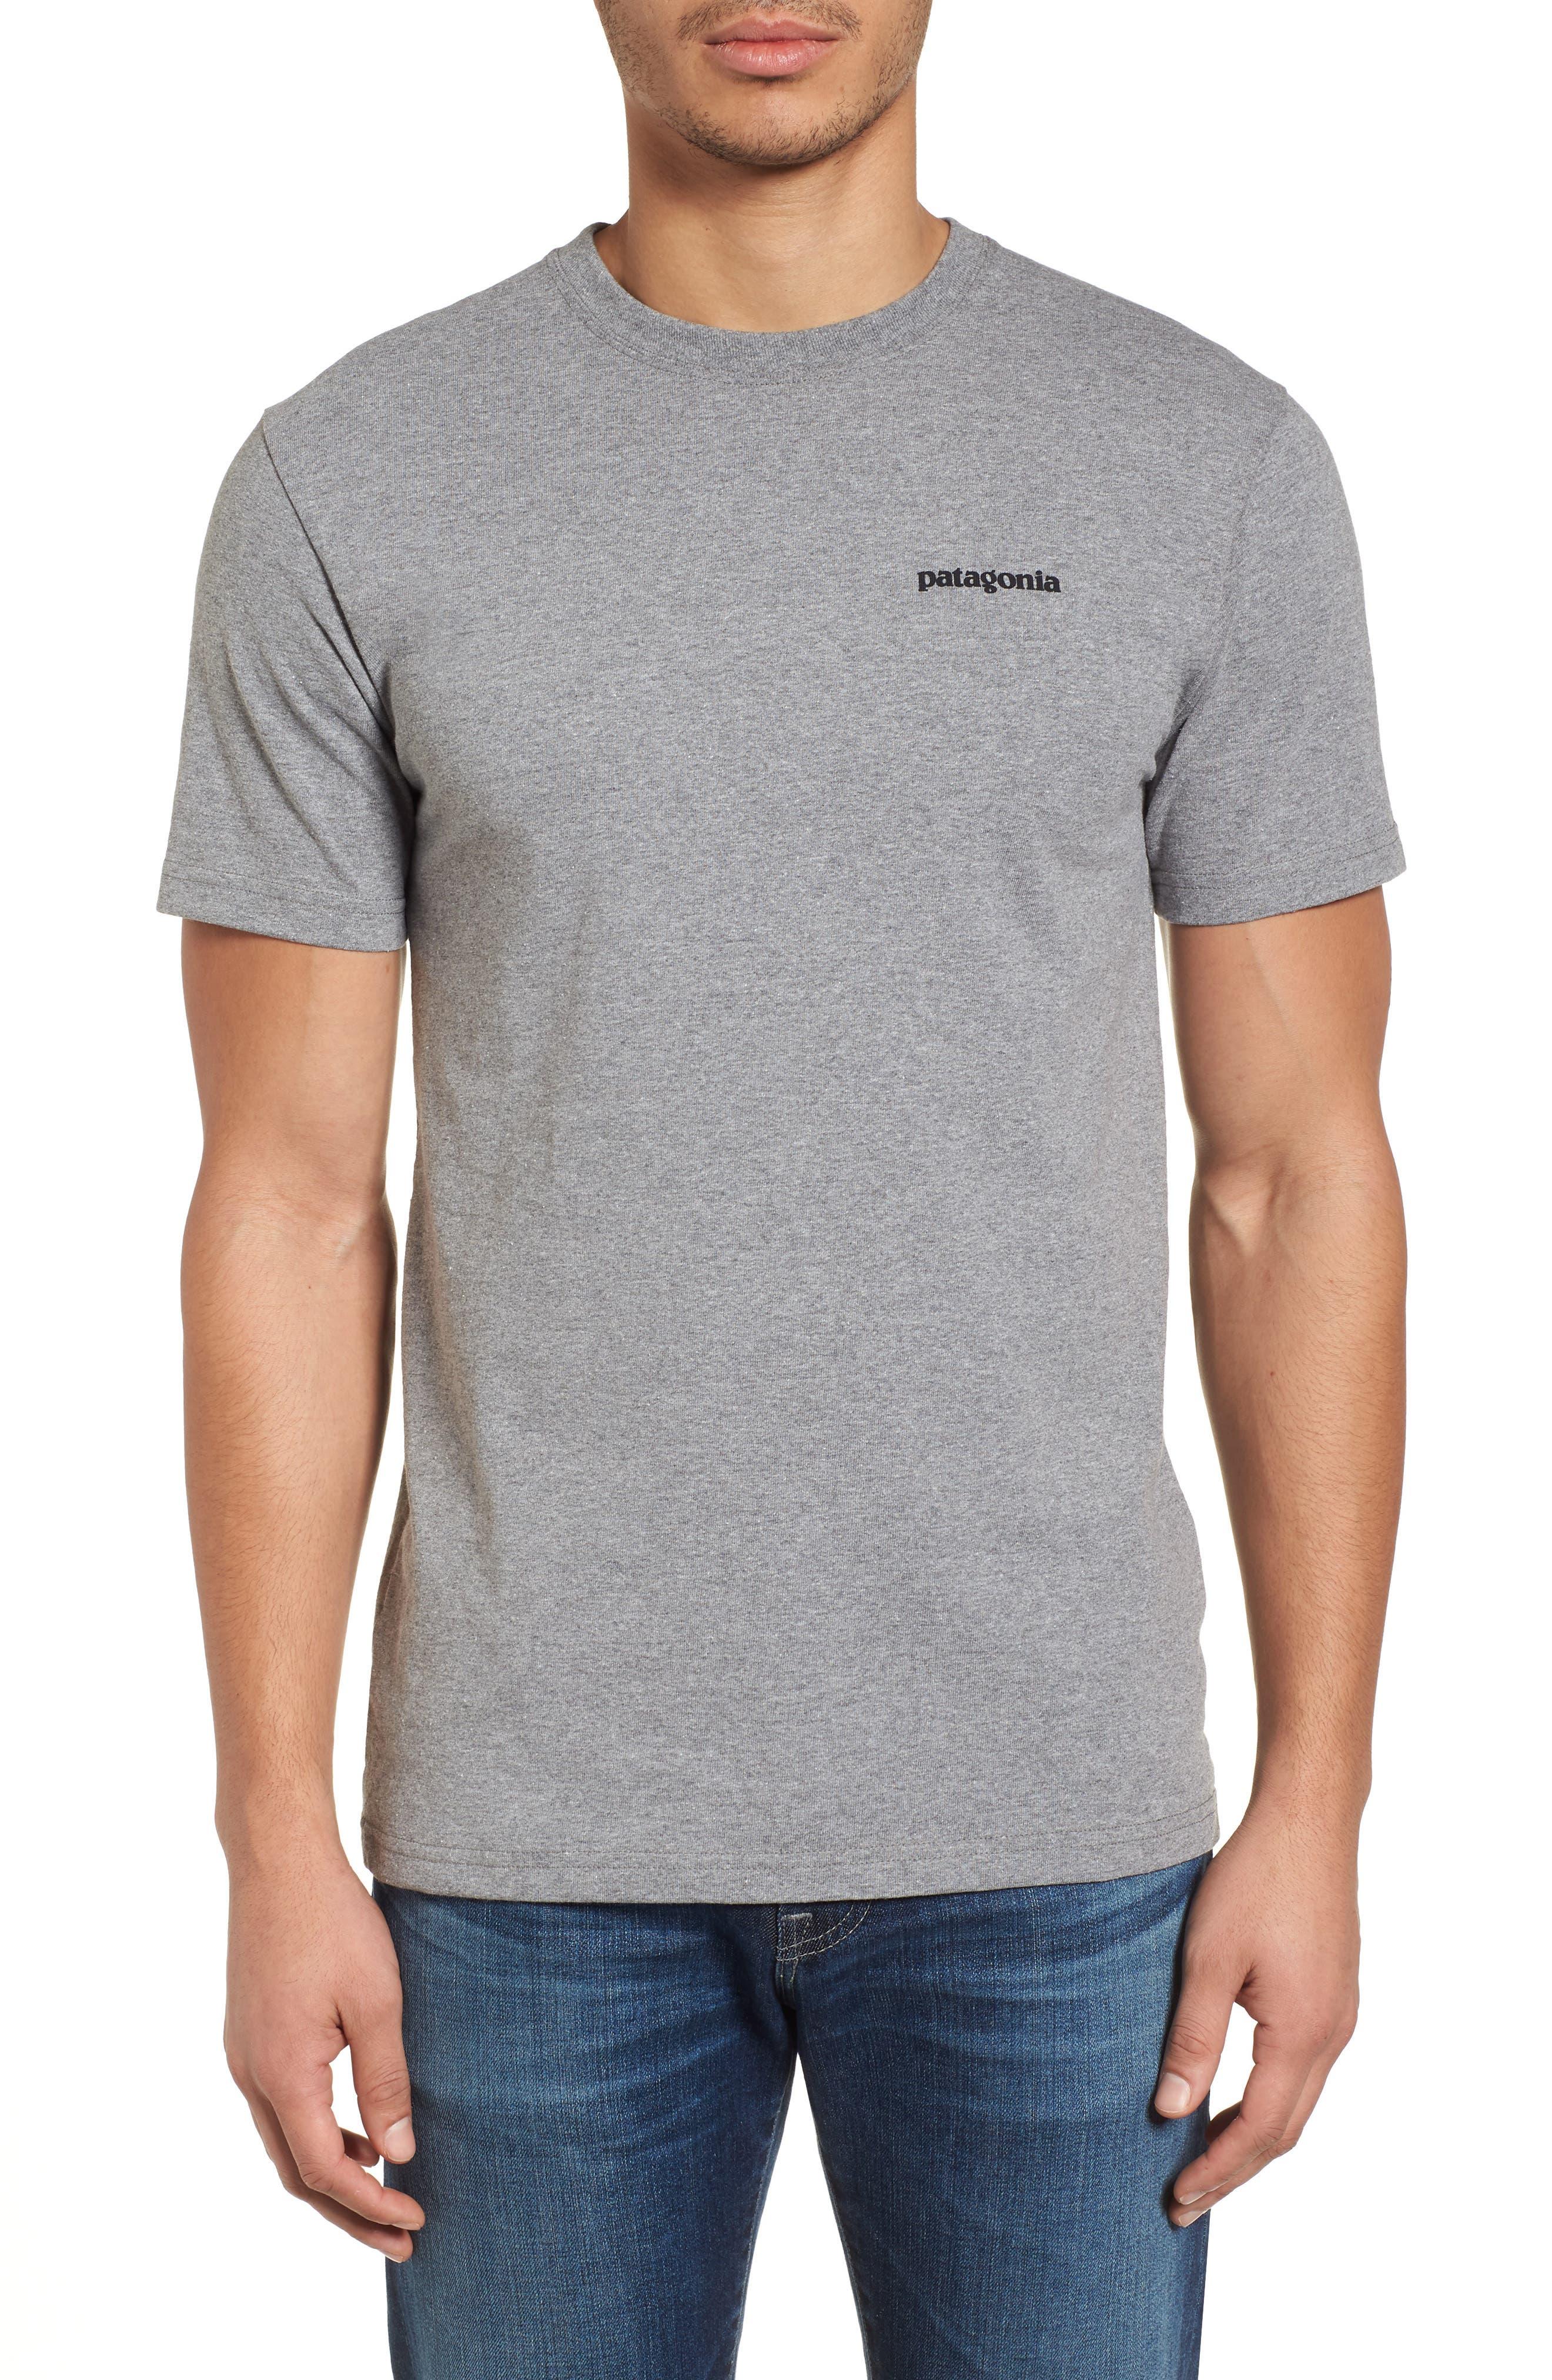 Glacier View Rising Responsibili-Tee T-Shirt,                         Main,                         color, 020